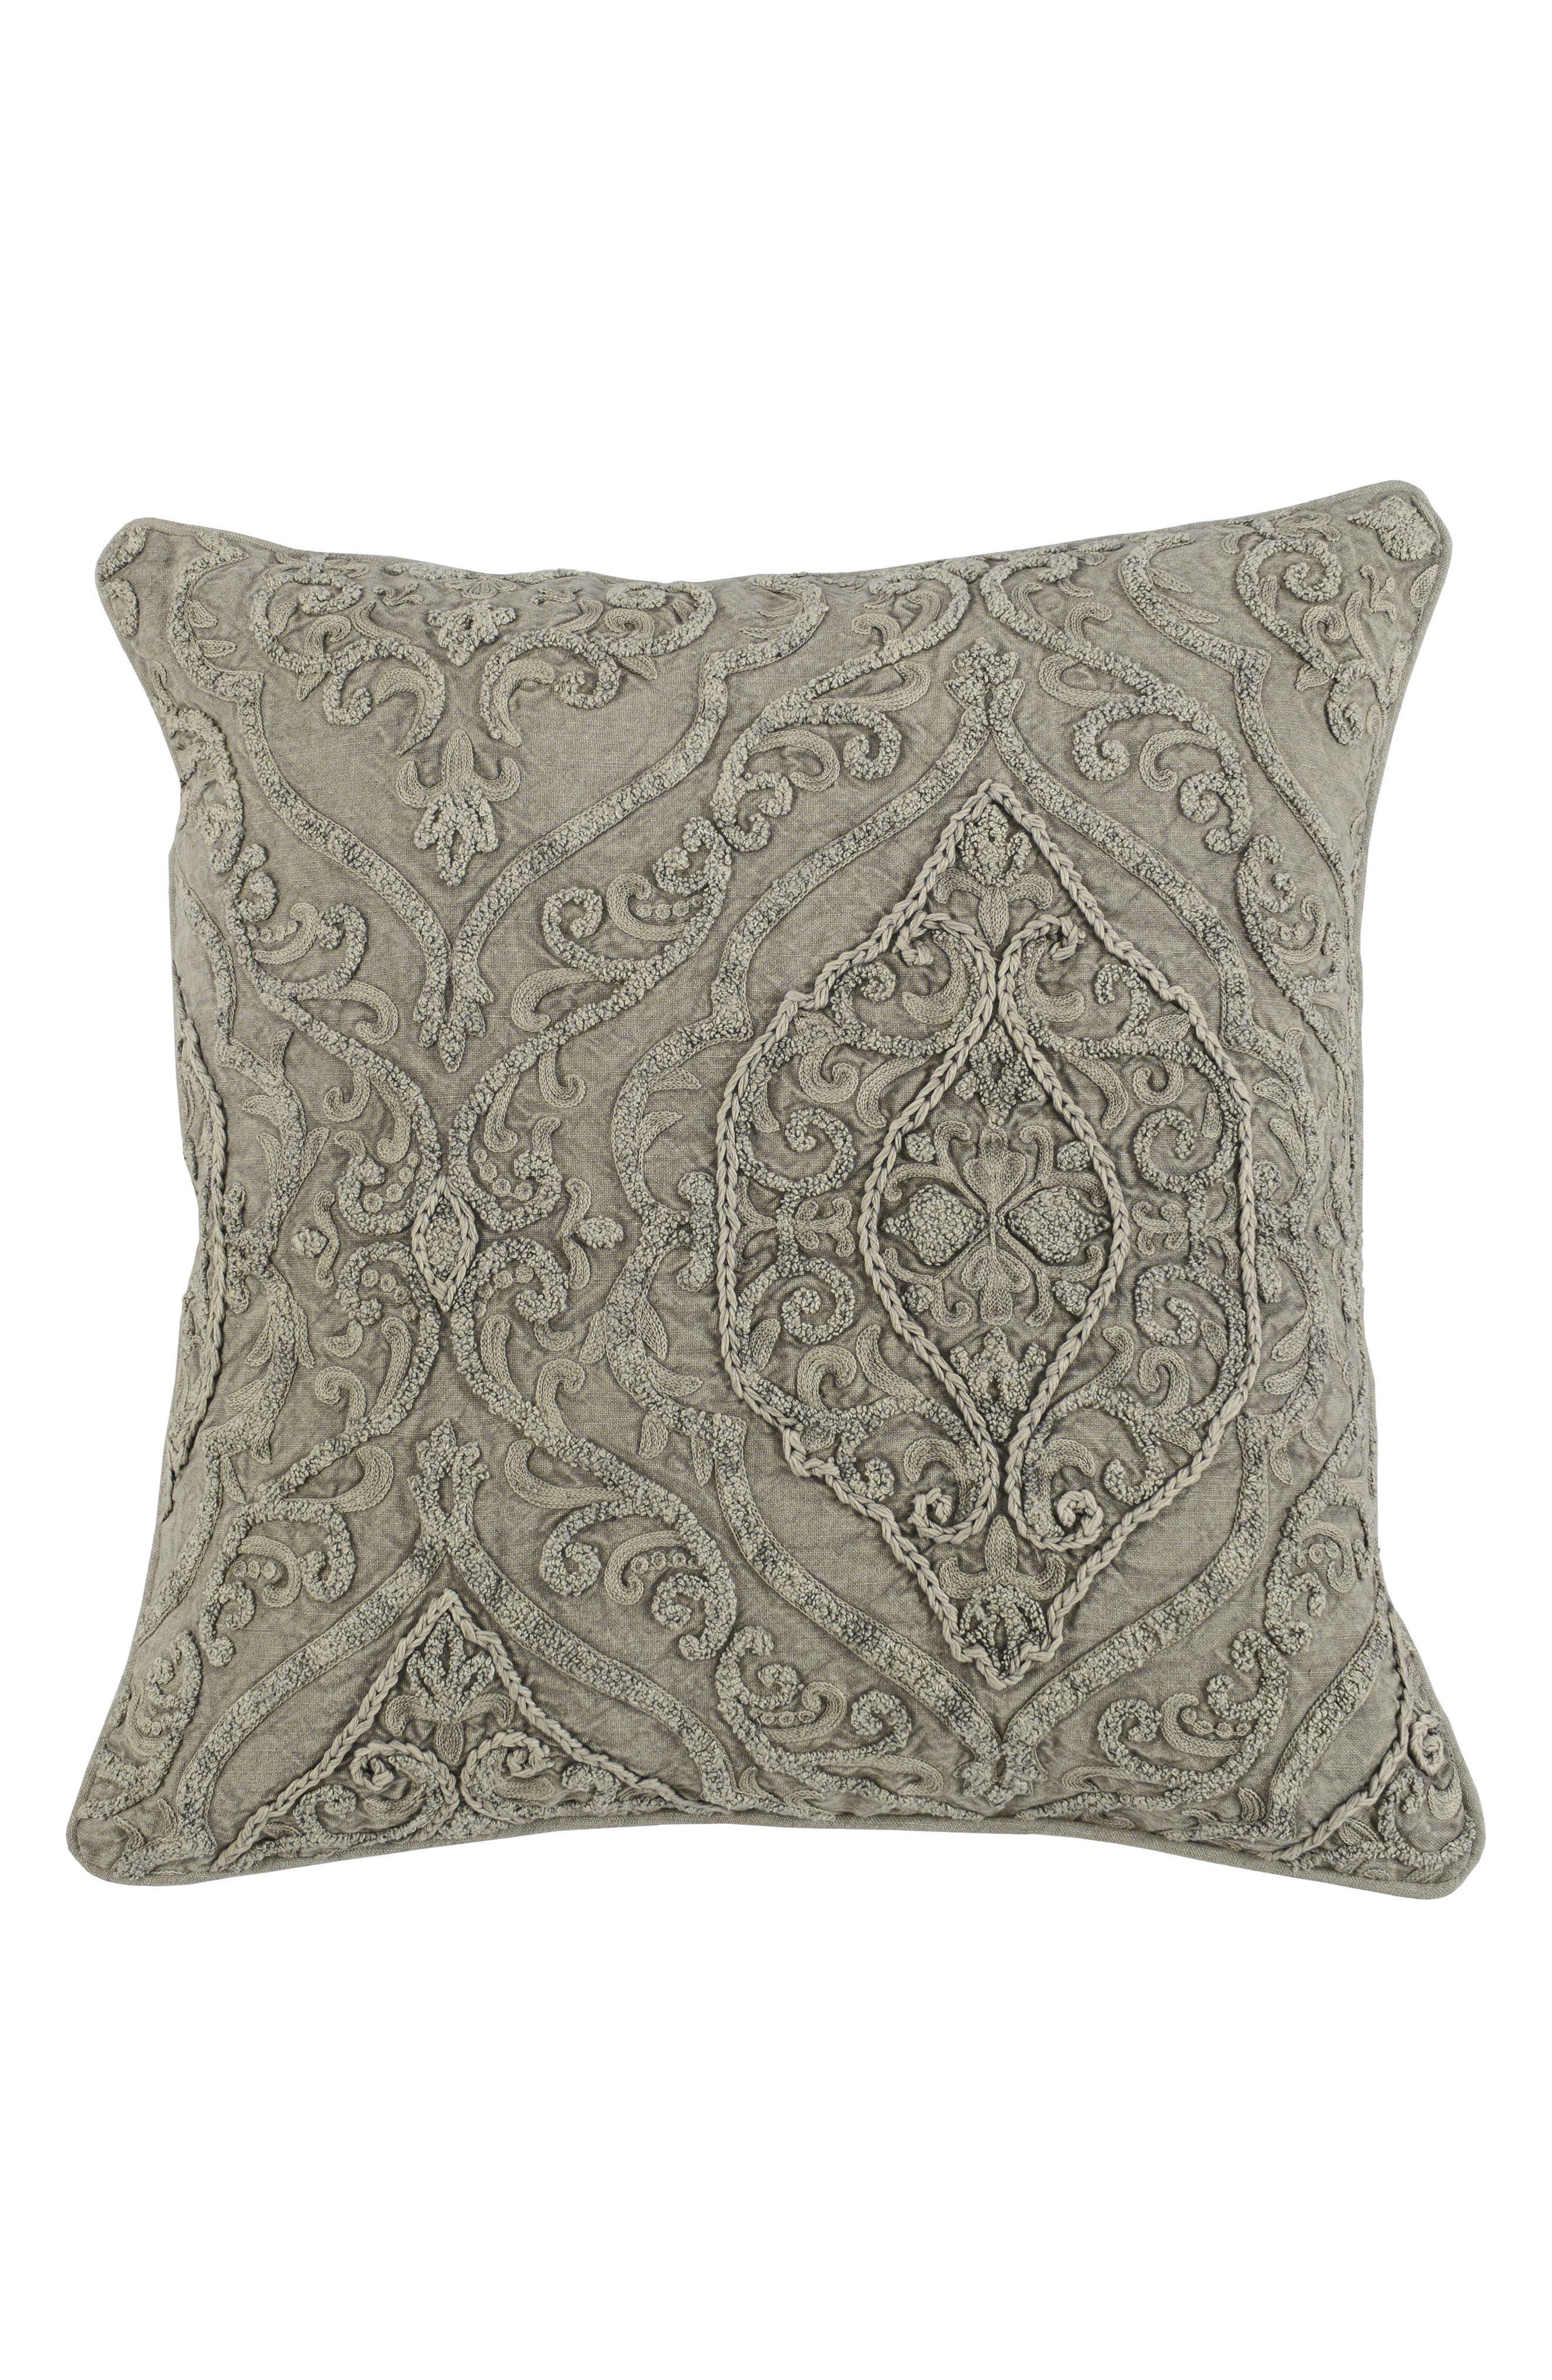 Abilene Accent Pillow,                         Main,                         color, Natural